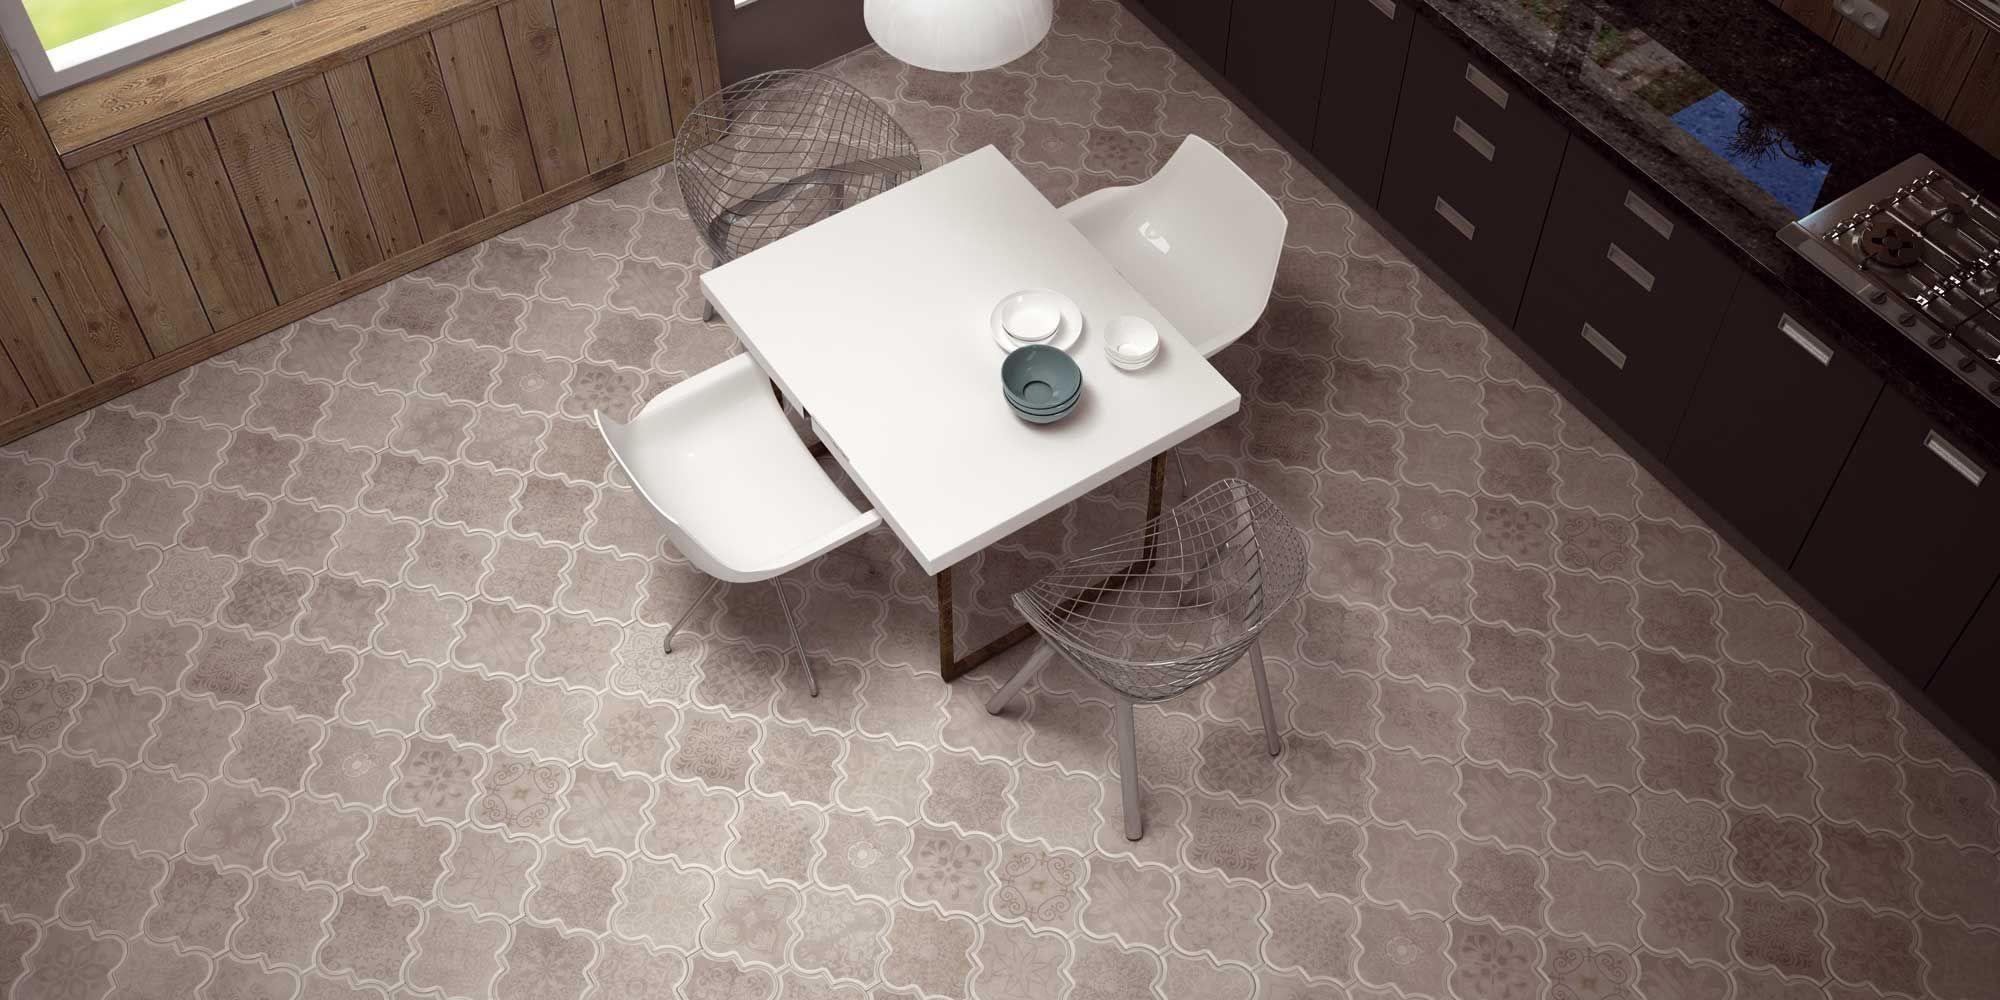 eternity Realonda tiles mediterranean moorish avail from